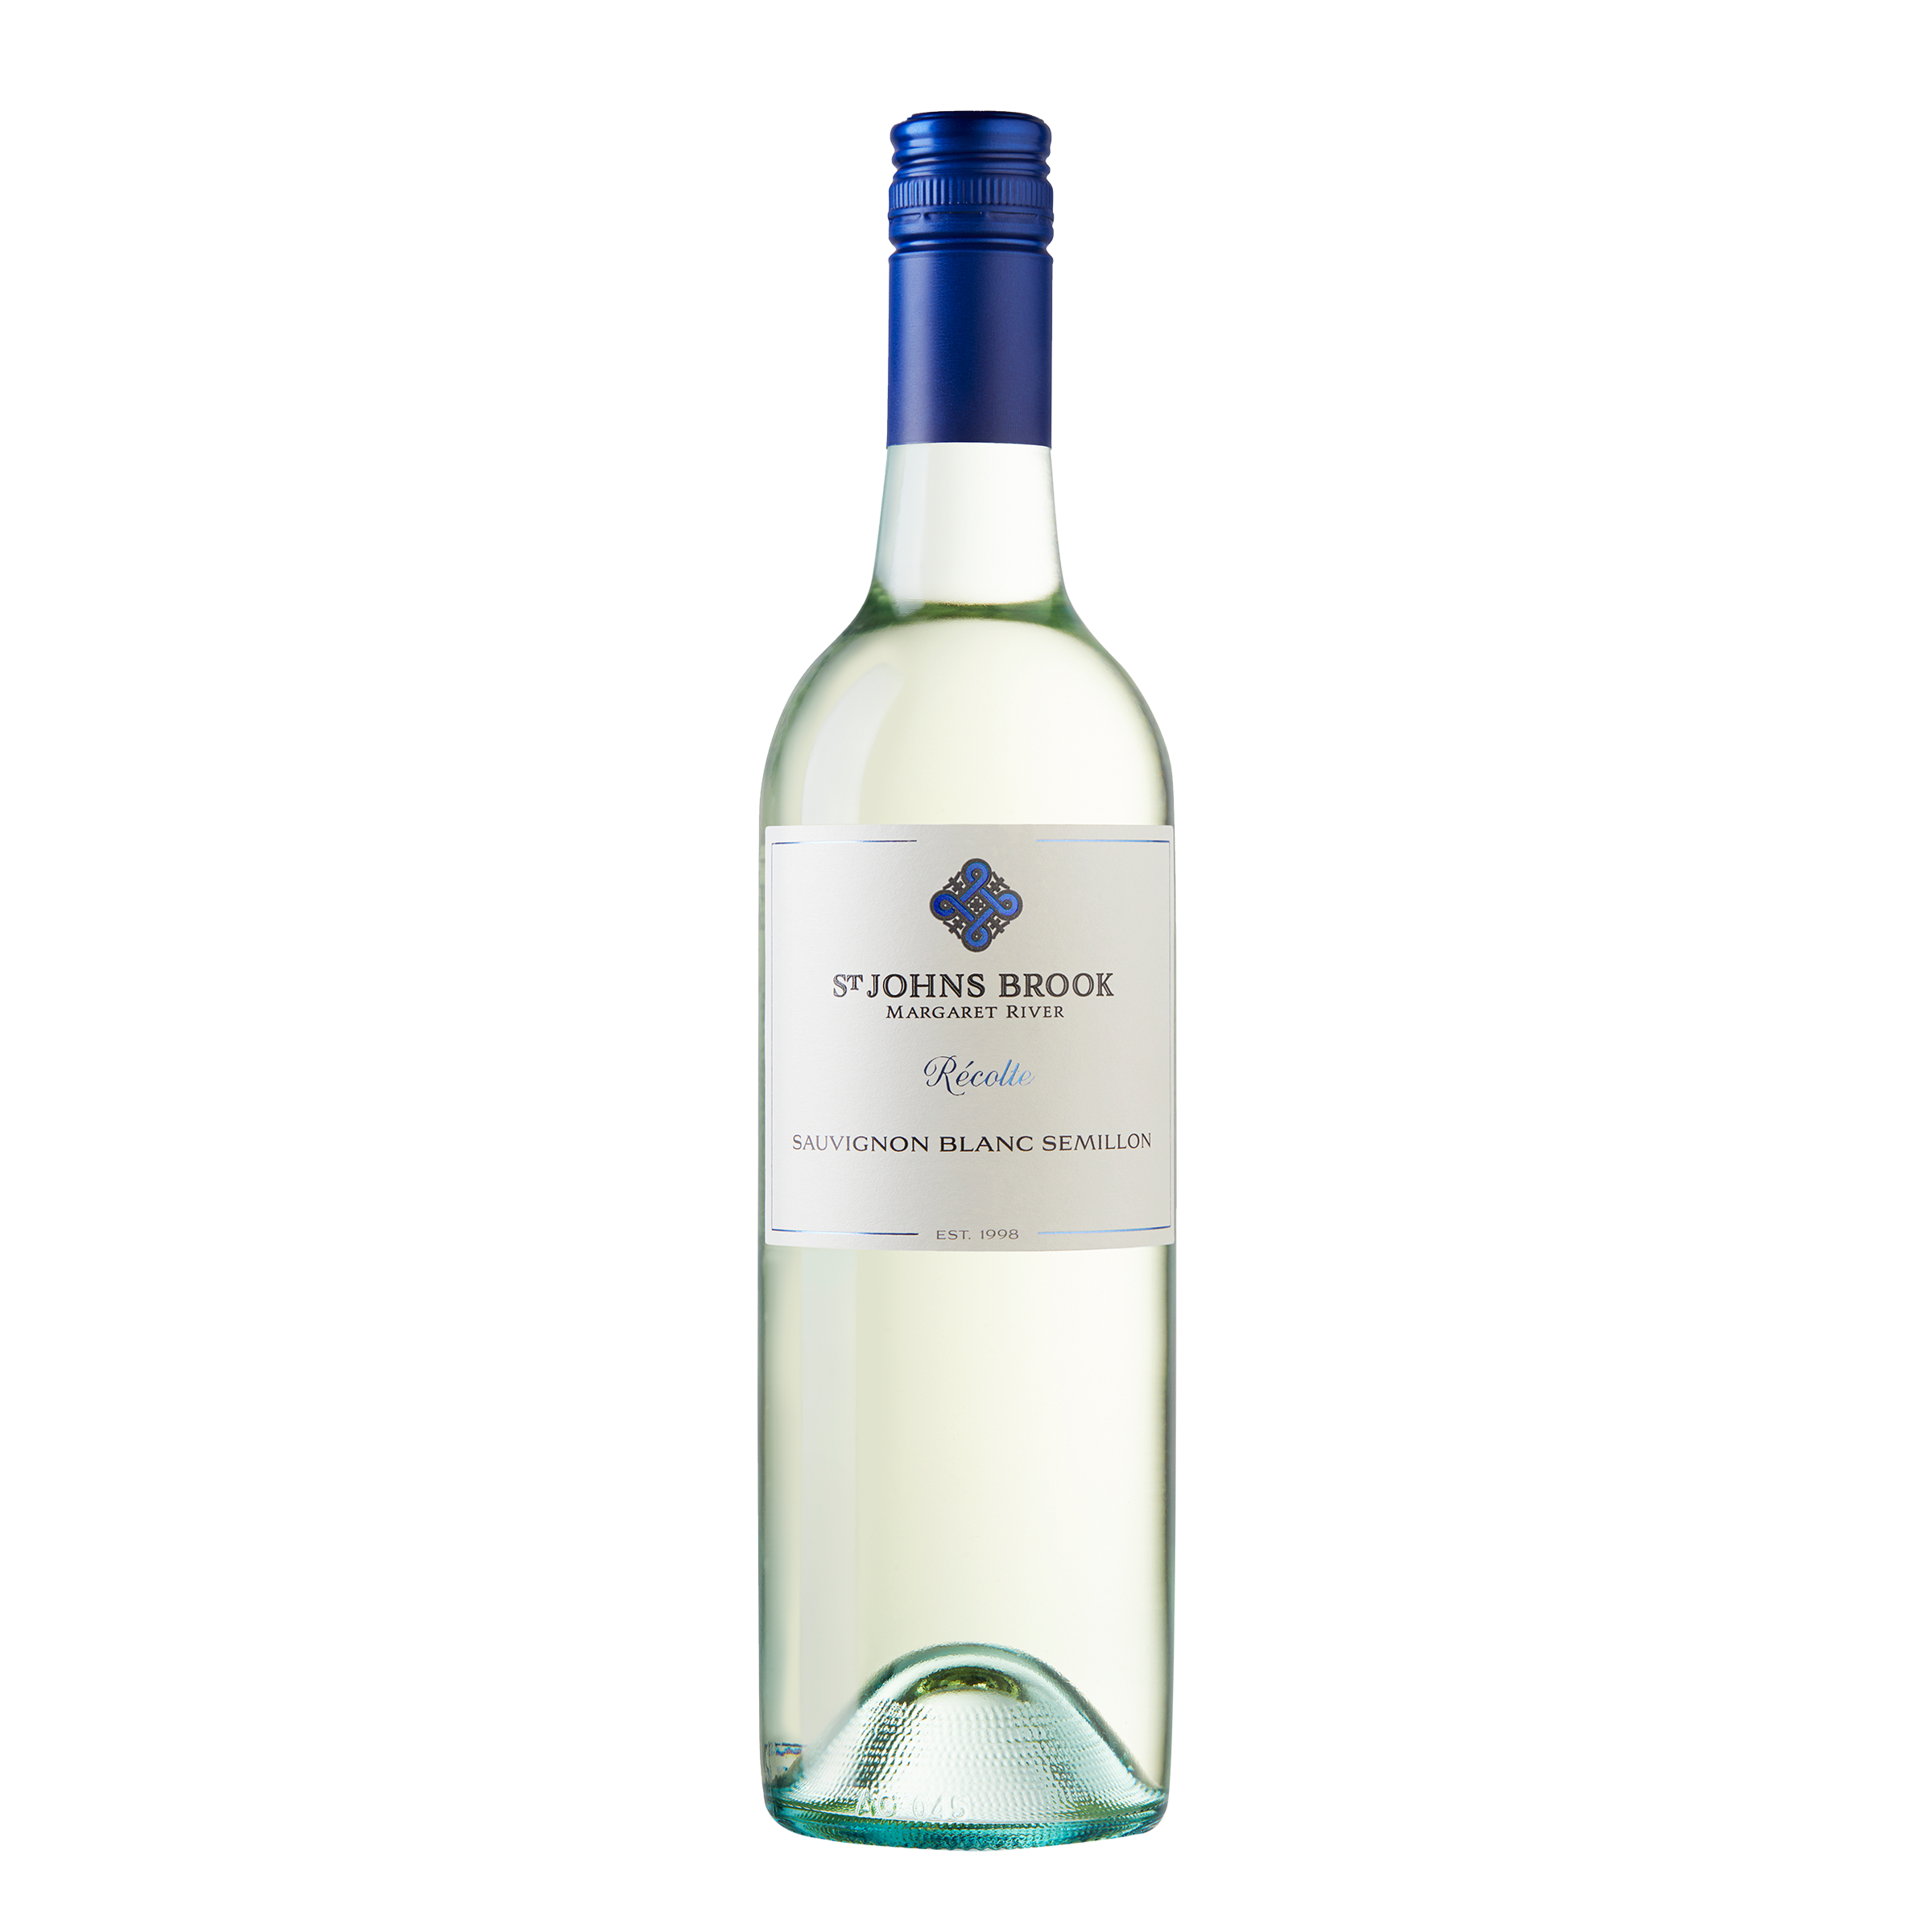 St Johns Brook Recolte Sauvignon Blanc Semillon